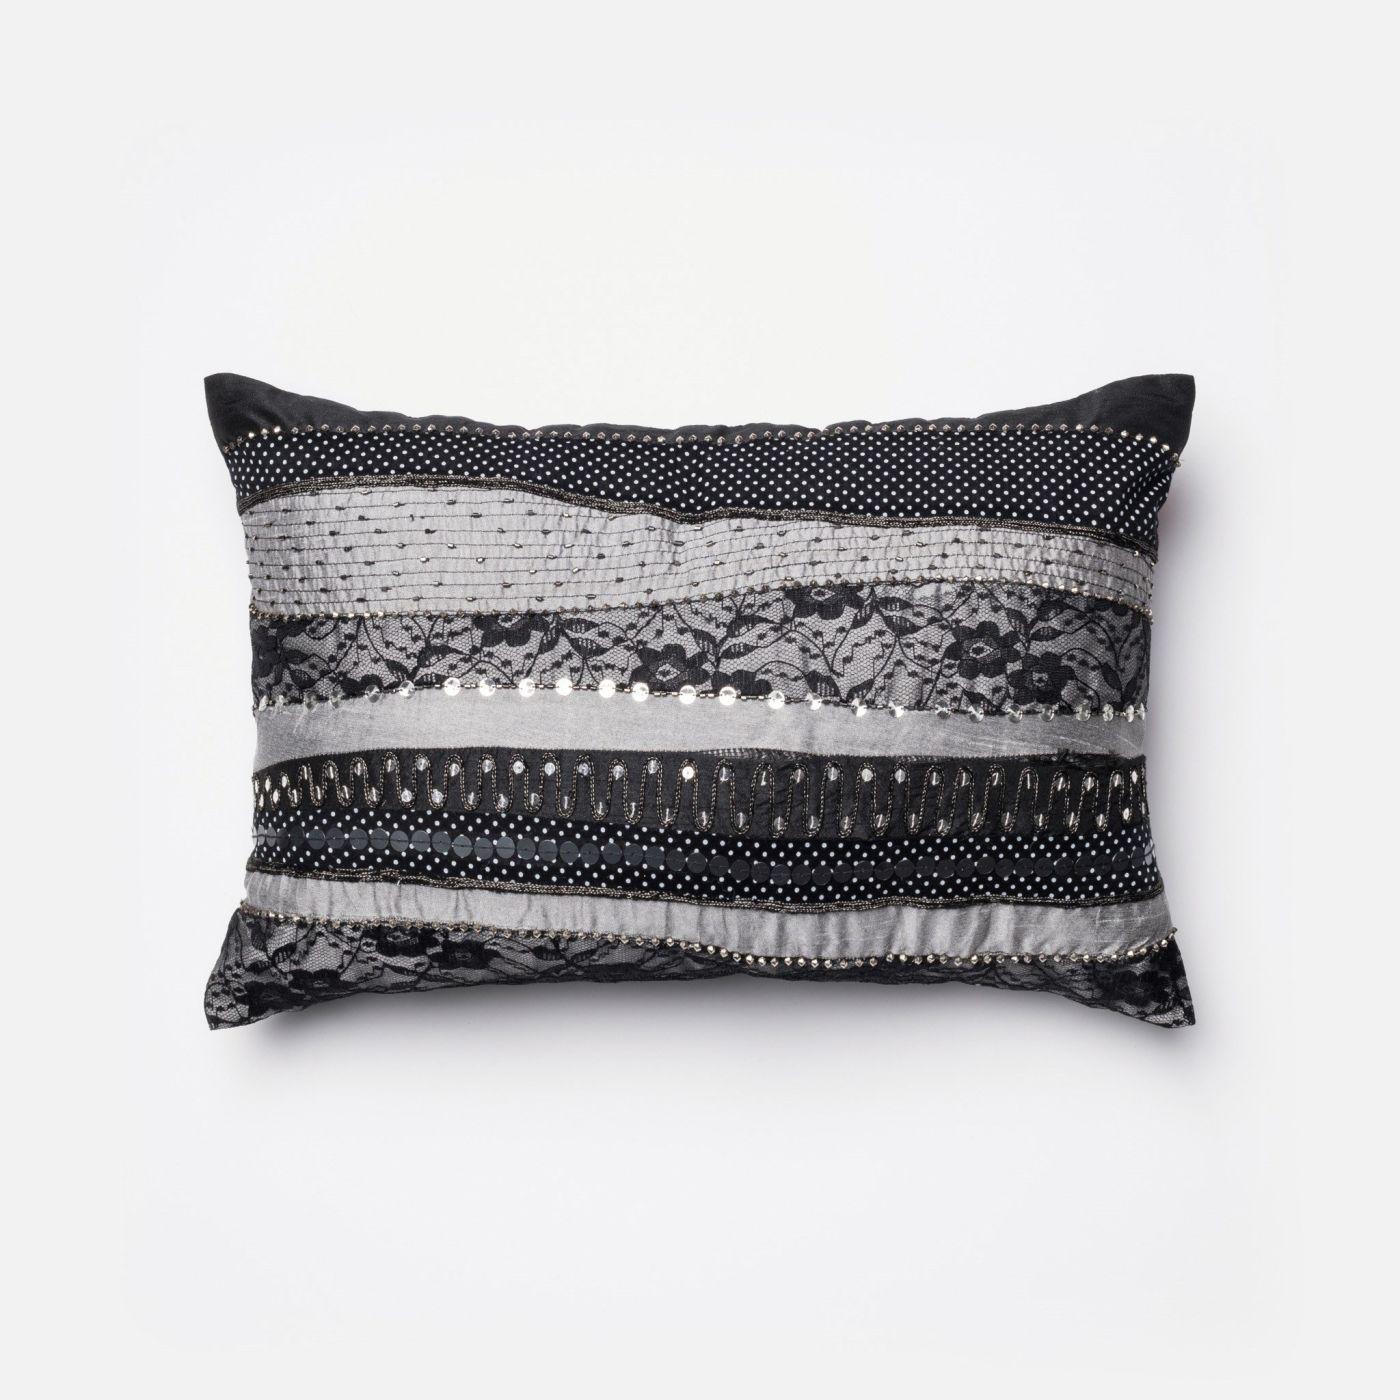 decorative full and design marvelous size pillow black white pillows christmas of throw